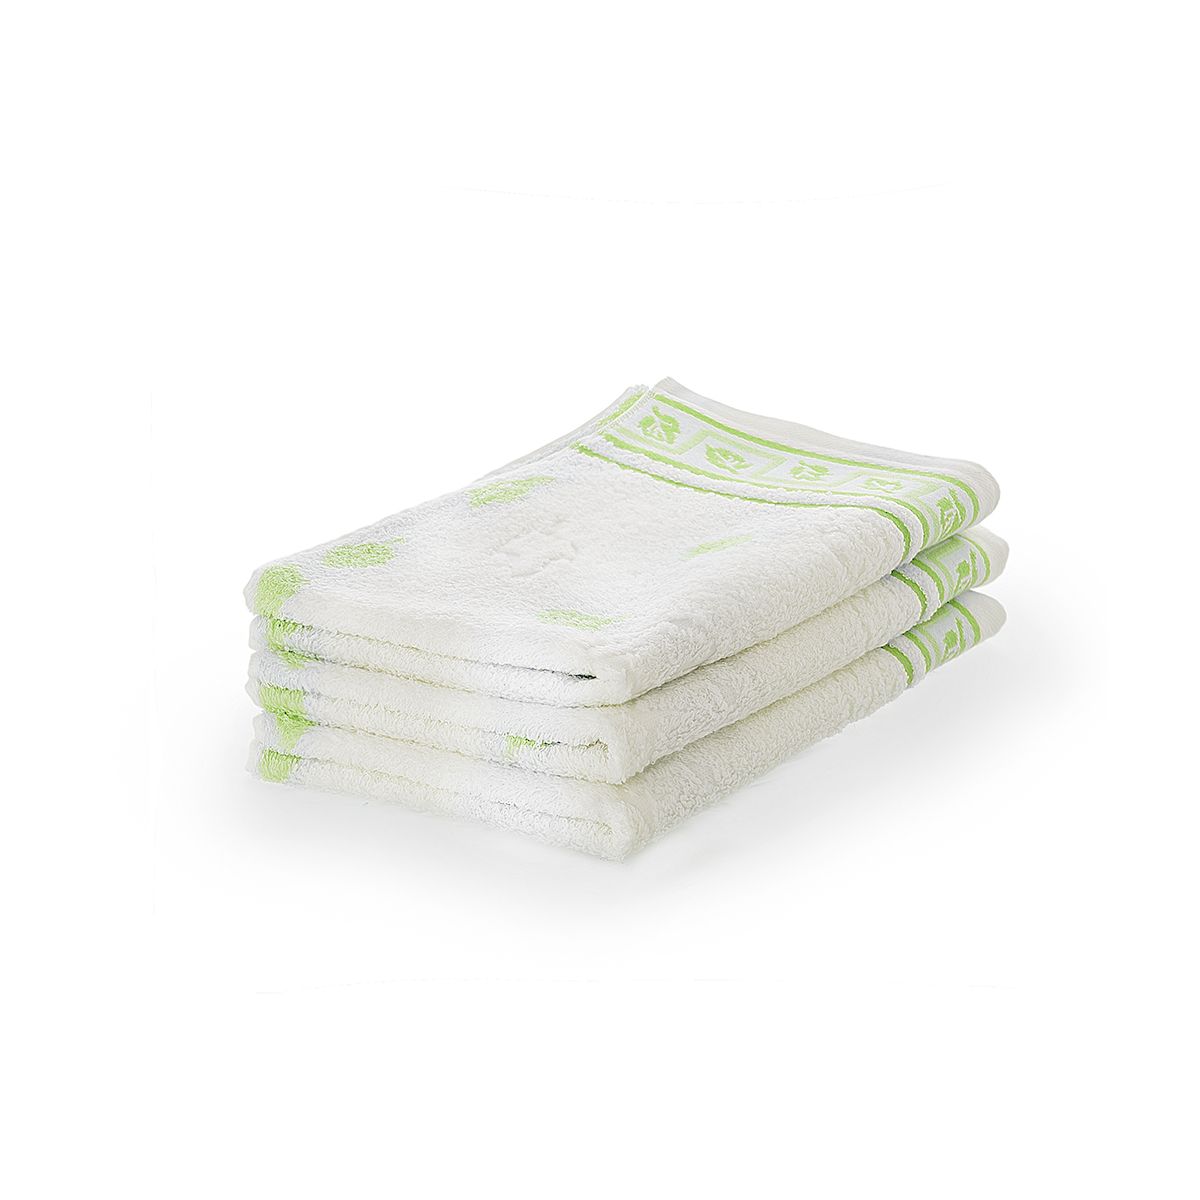 Полотенце Листопад Зеленый, размер 65х135 смМахровые полотенца<br>Плотность ткани:480 г/кв. м.<br><br>Тип: Полотенце<br>Размер: 65х135<br>Материал: Махра